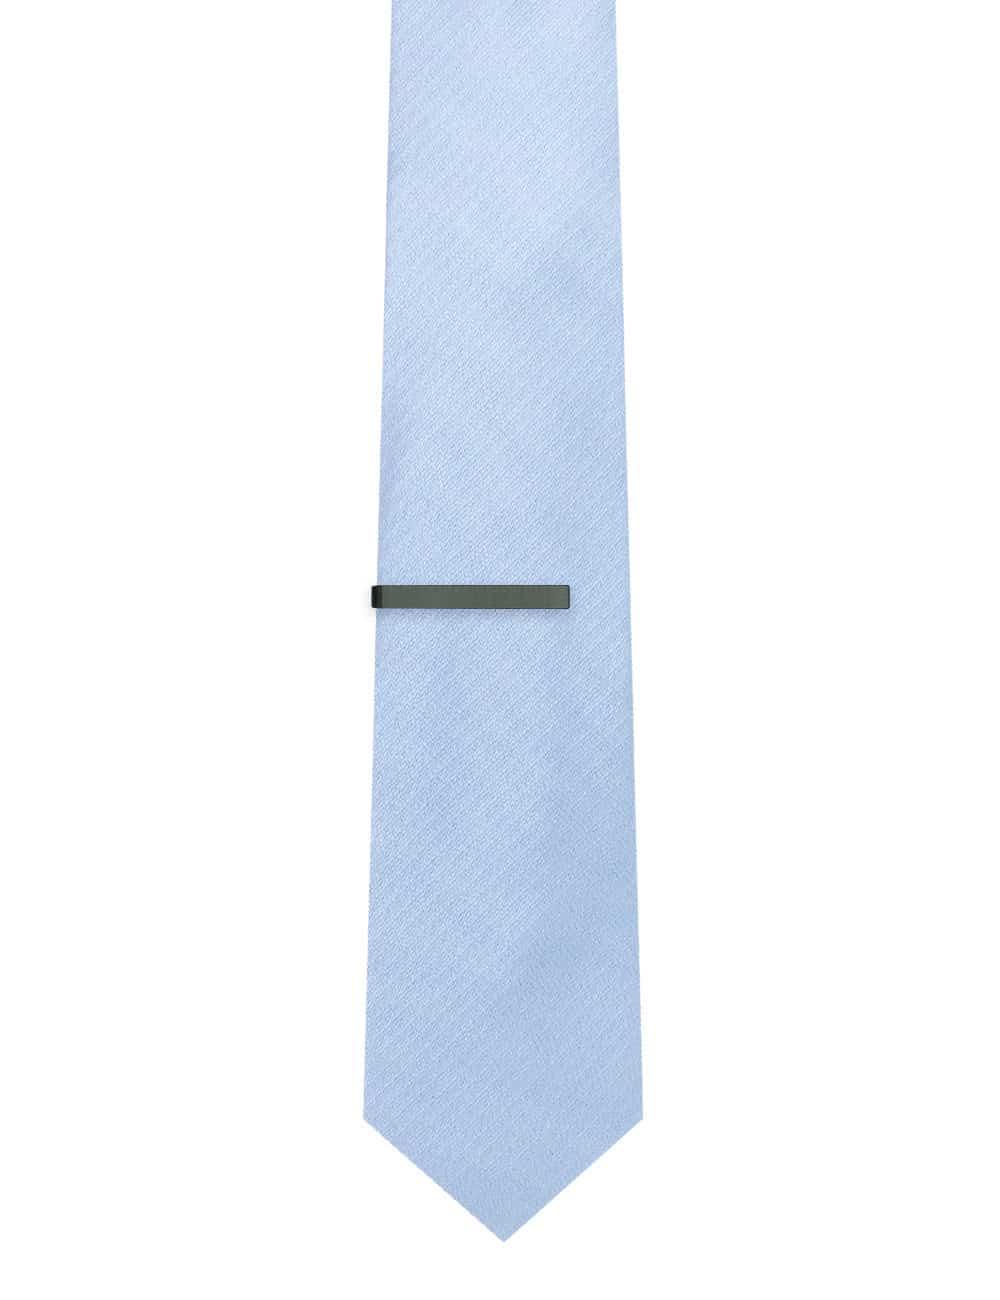 Classic Gunmetal Tie Clip T101FC-019